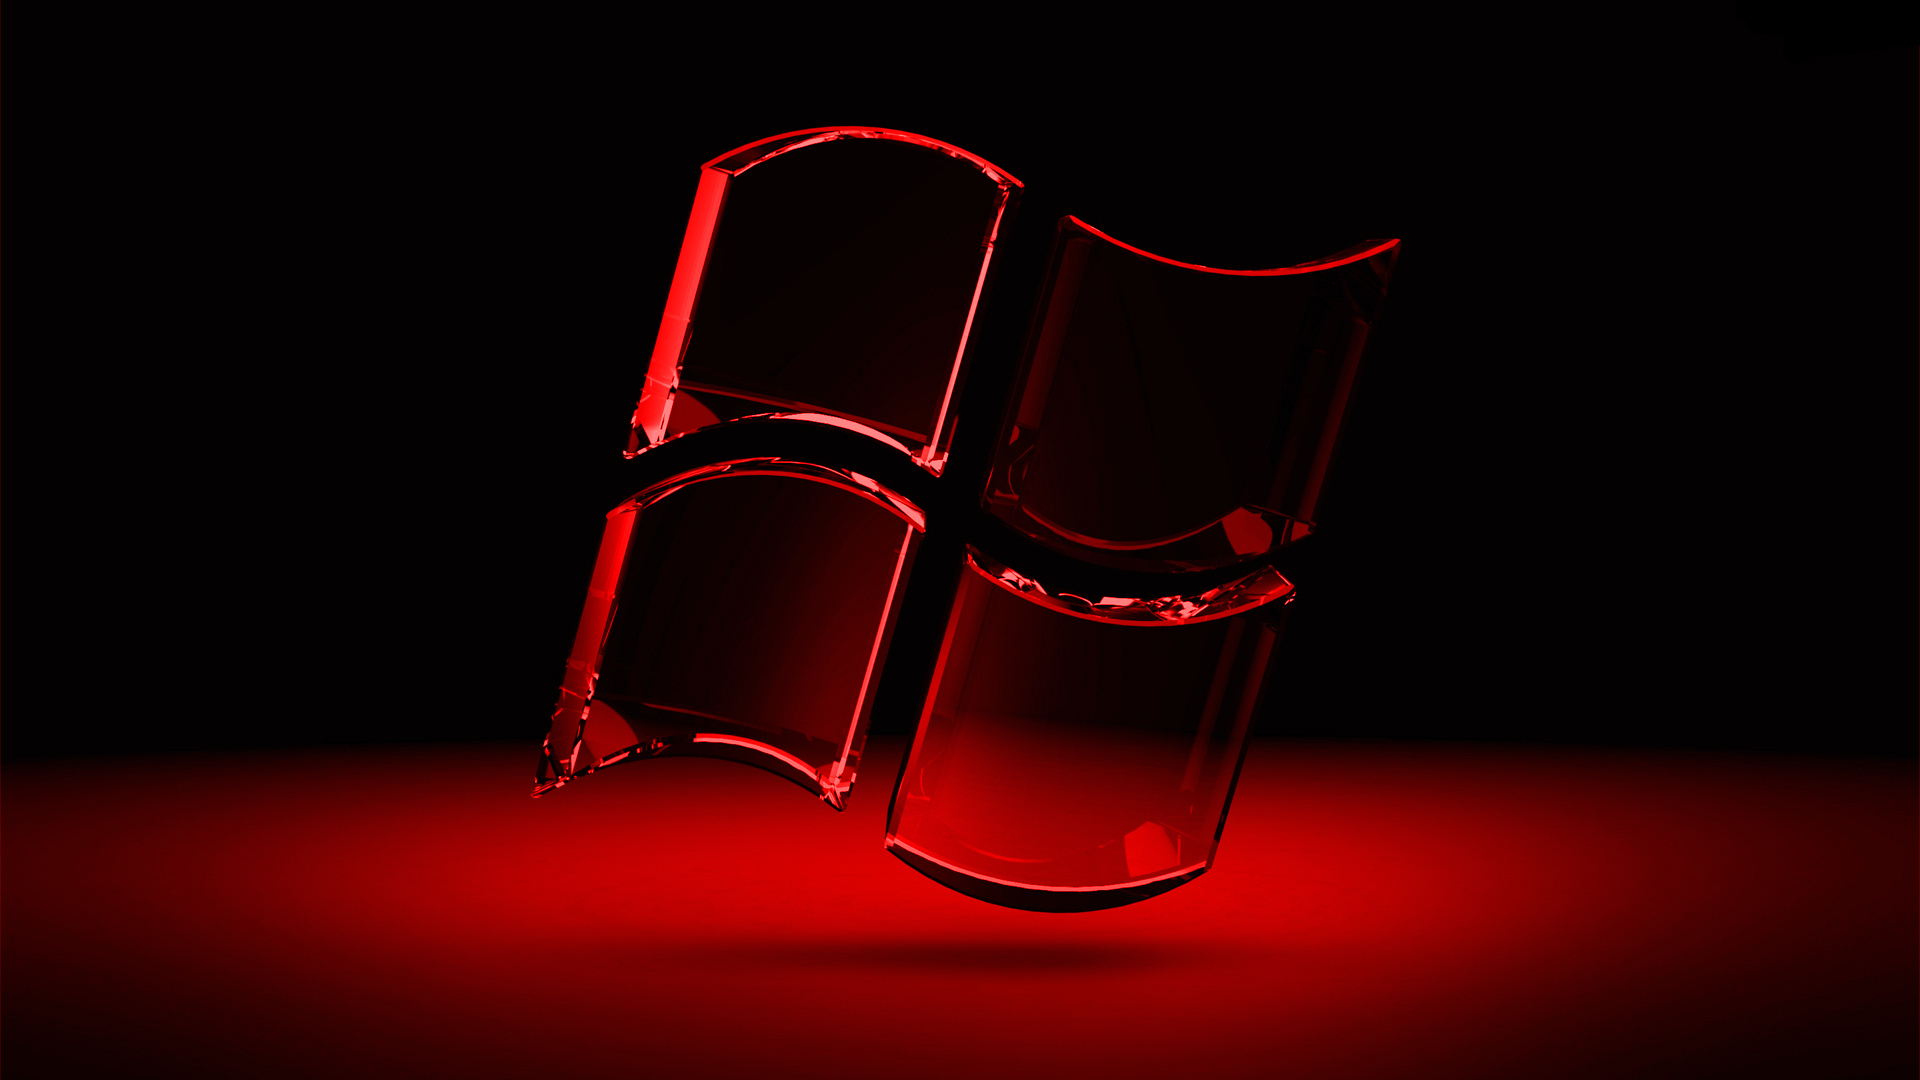 windows red wallpaper vista - photo #18